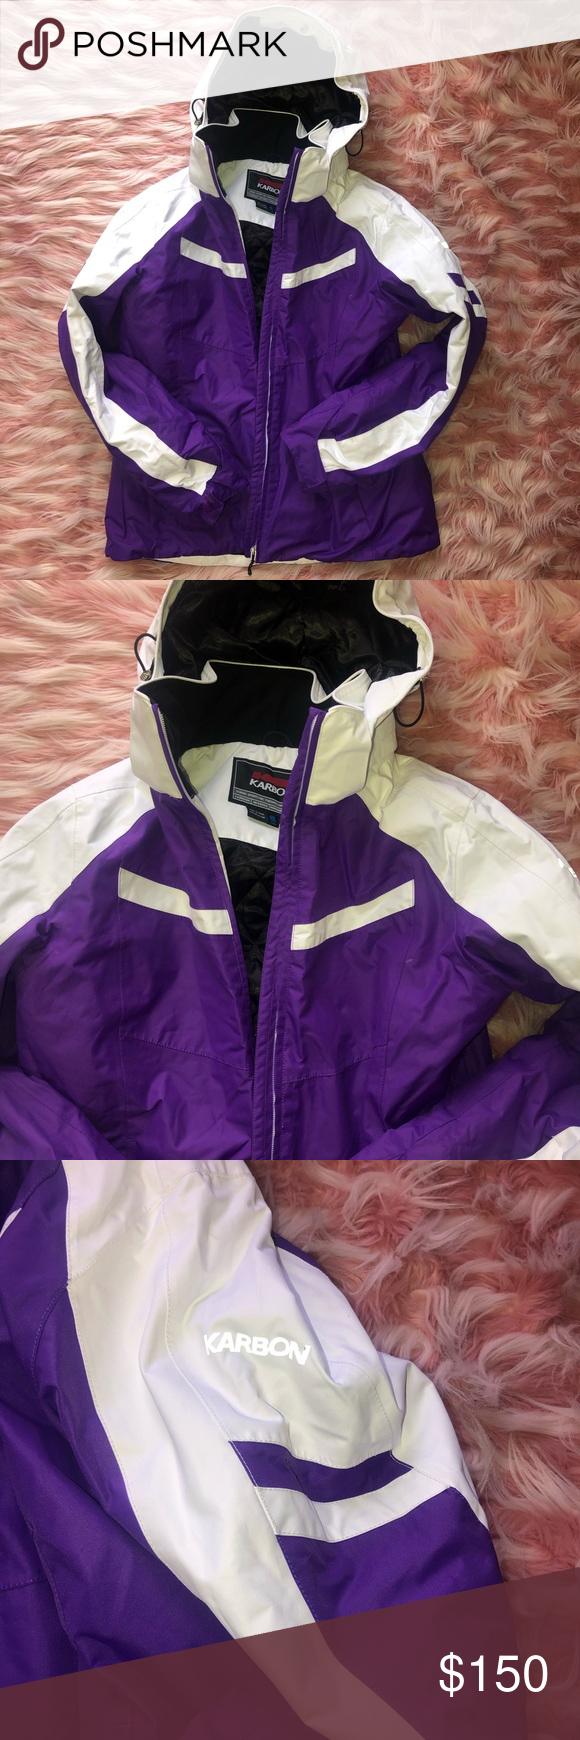 Women S Karbon Ski Jacket Size 12 Jackets Women